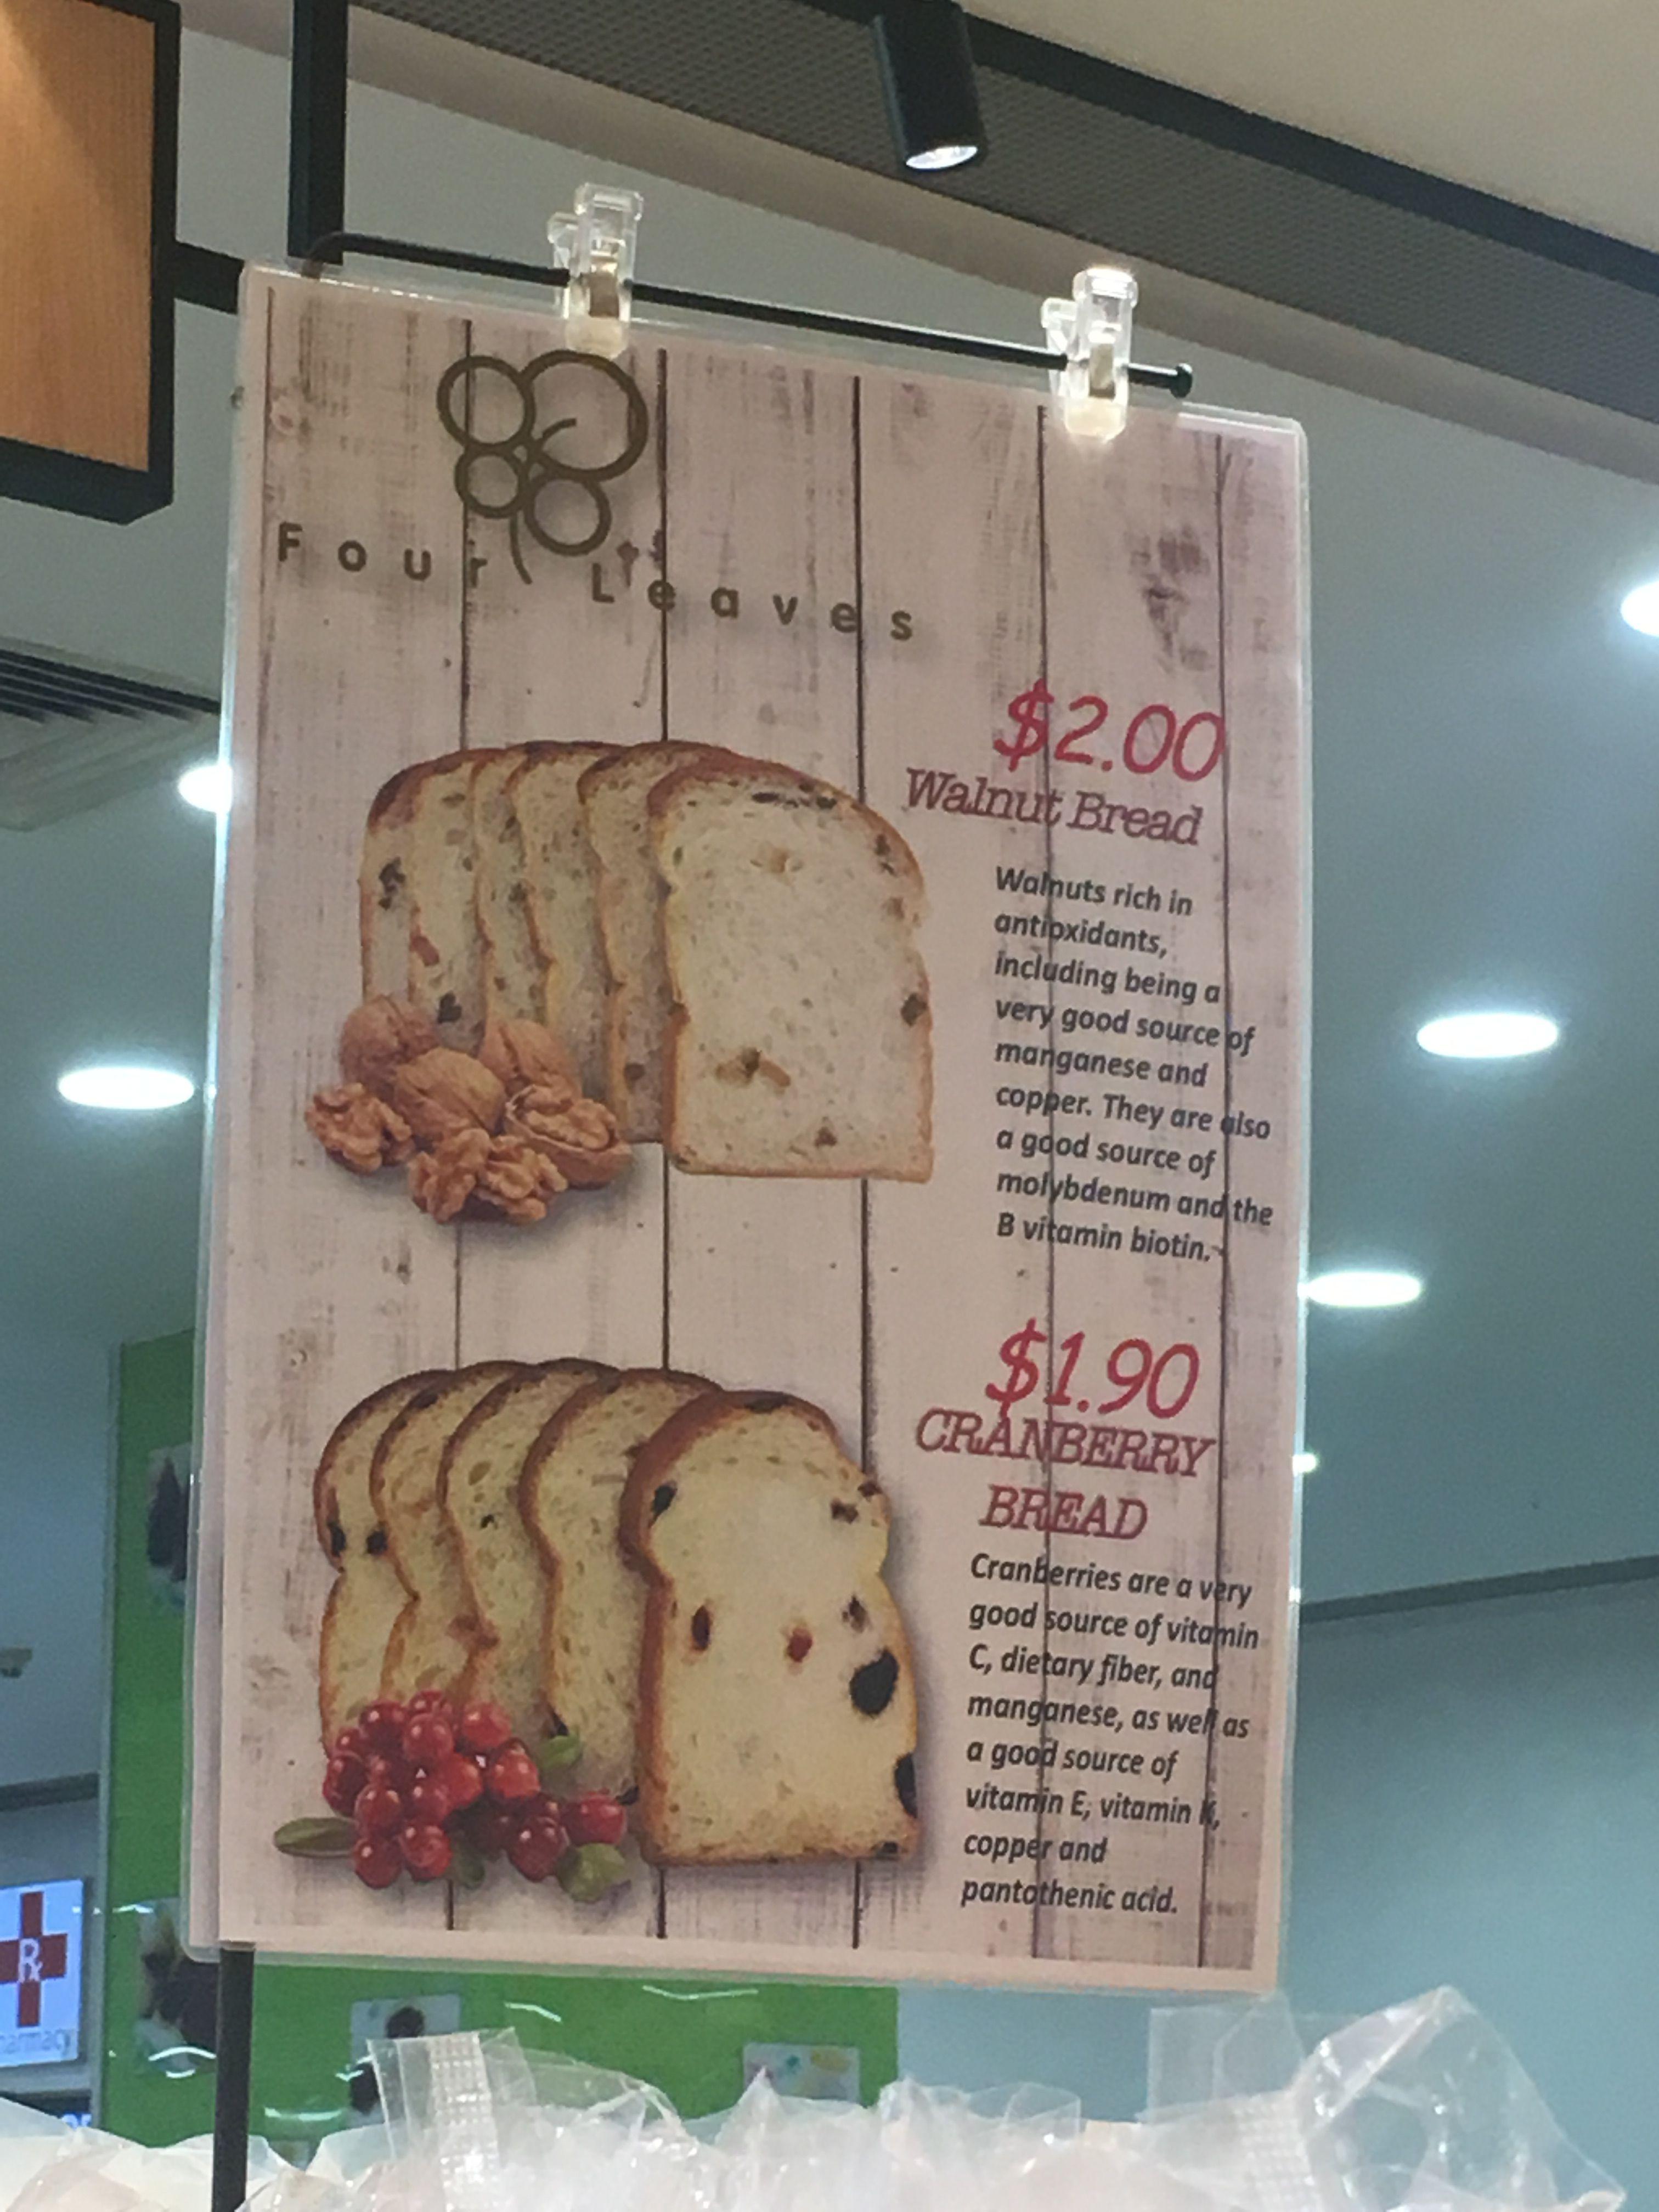 Pin by Sarah Lim Rui En on Random facts haha ) Food